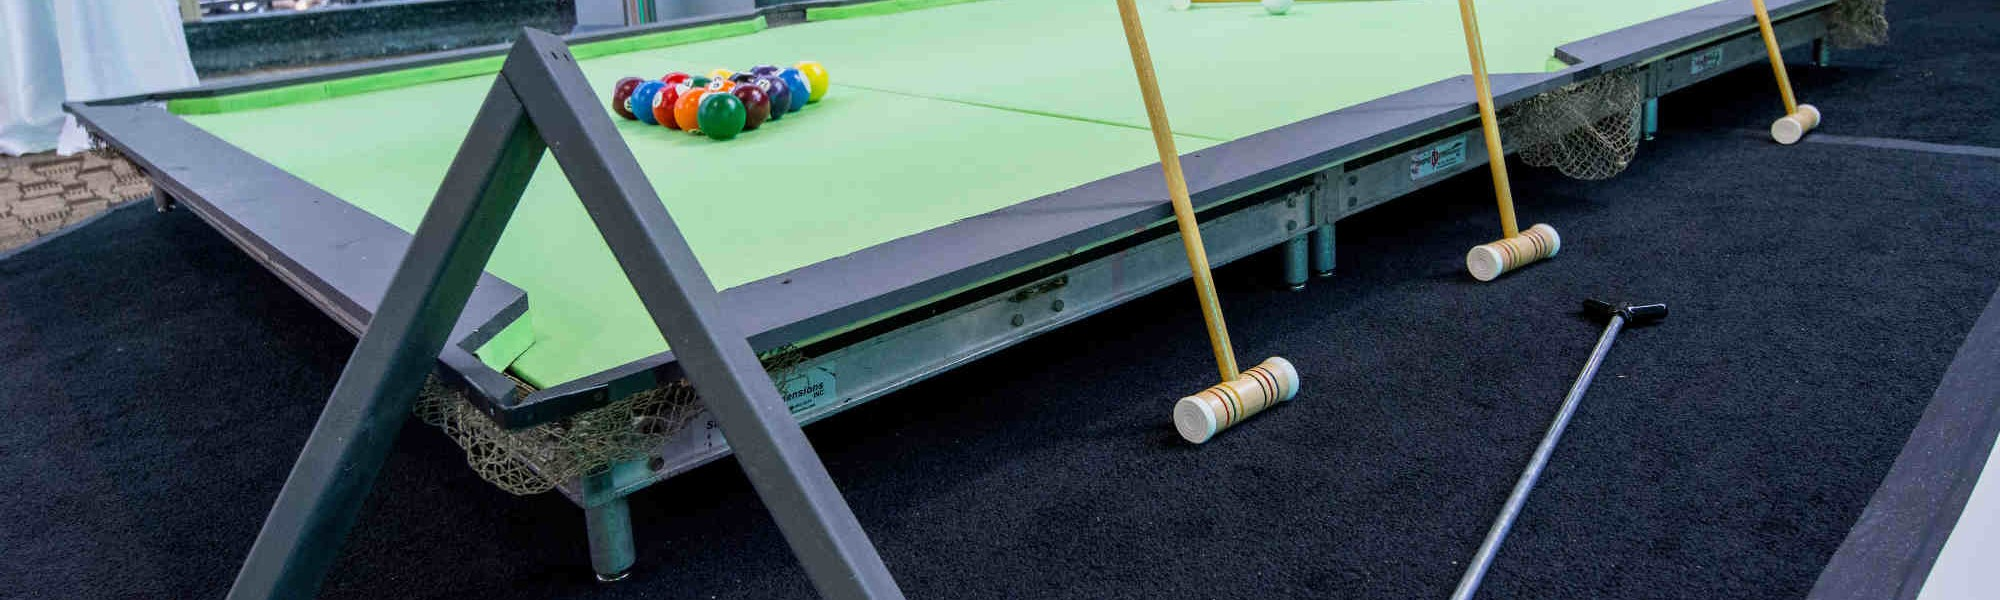 Giant Games Pool Table slider